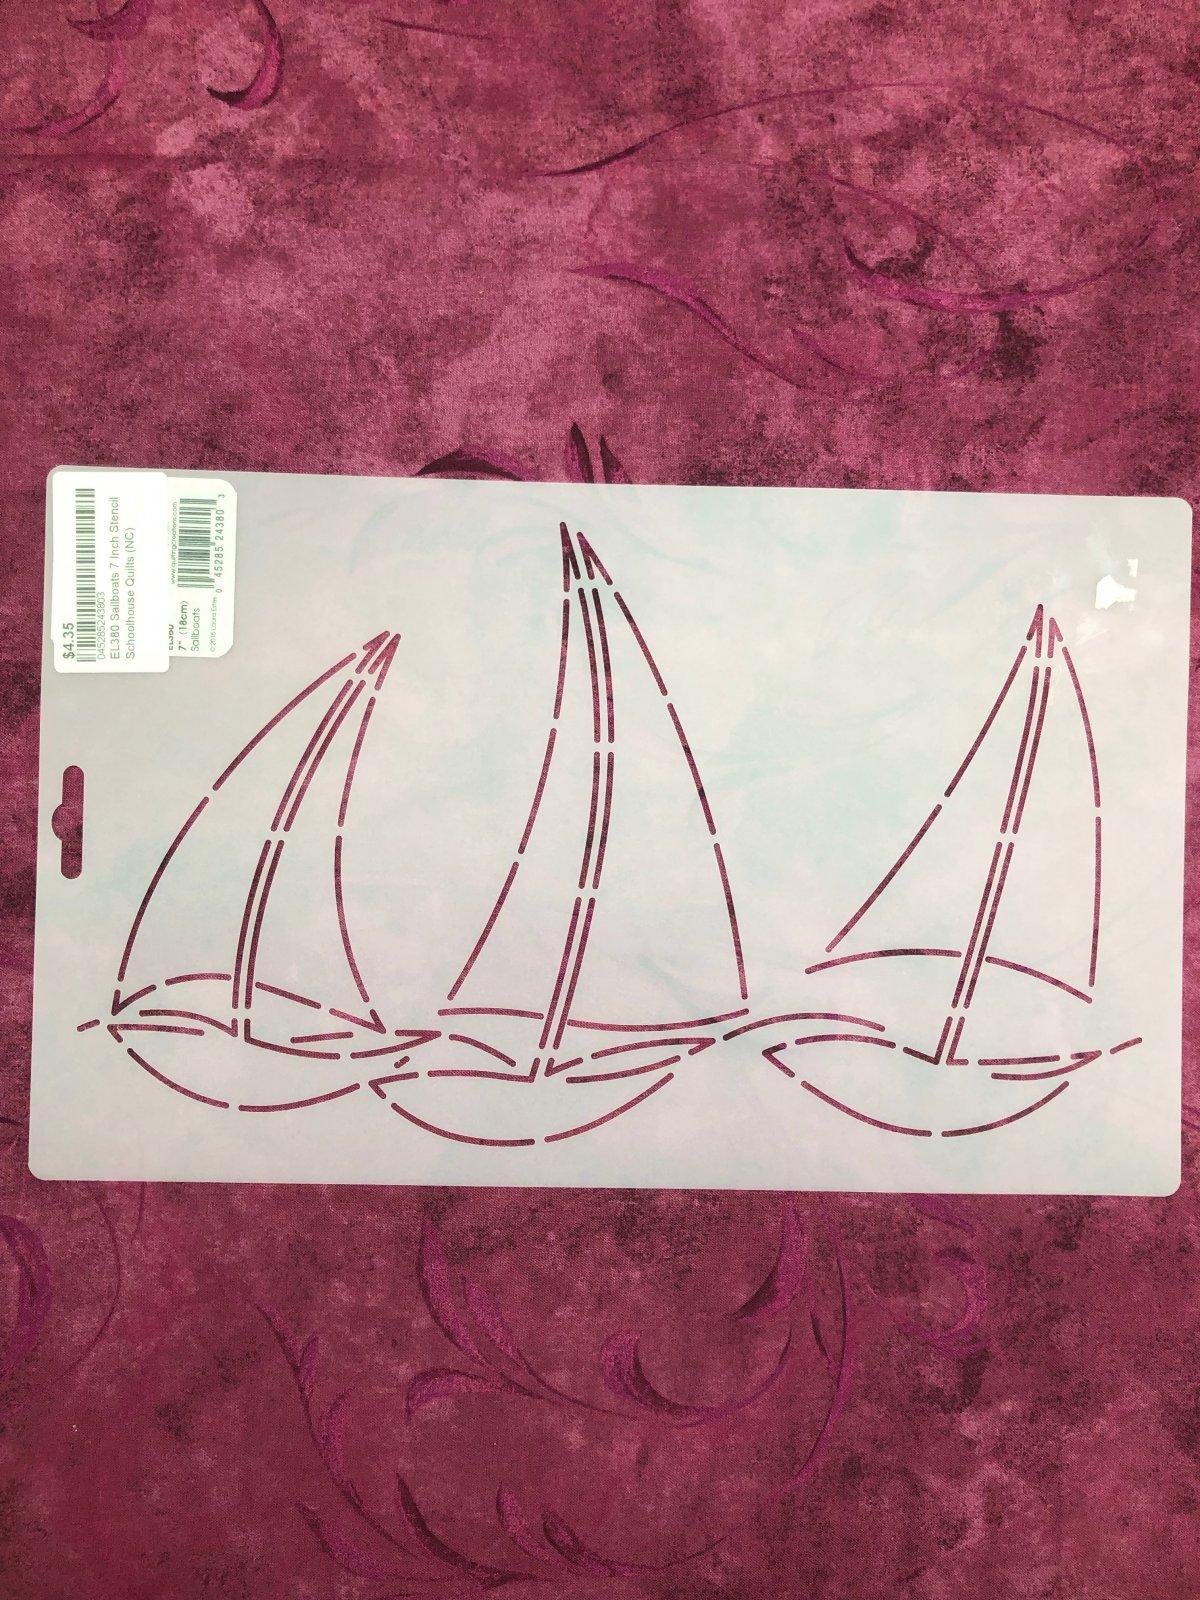 EL380 Sailboats 7 Inch Stencil